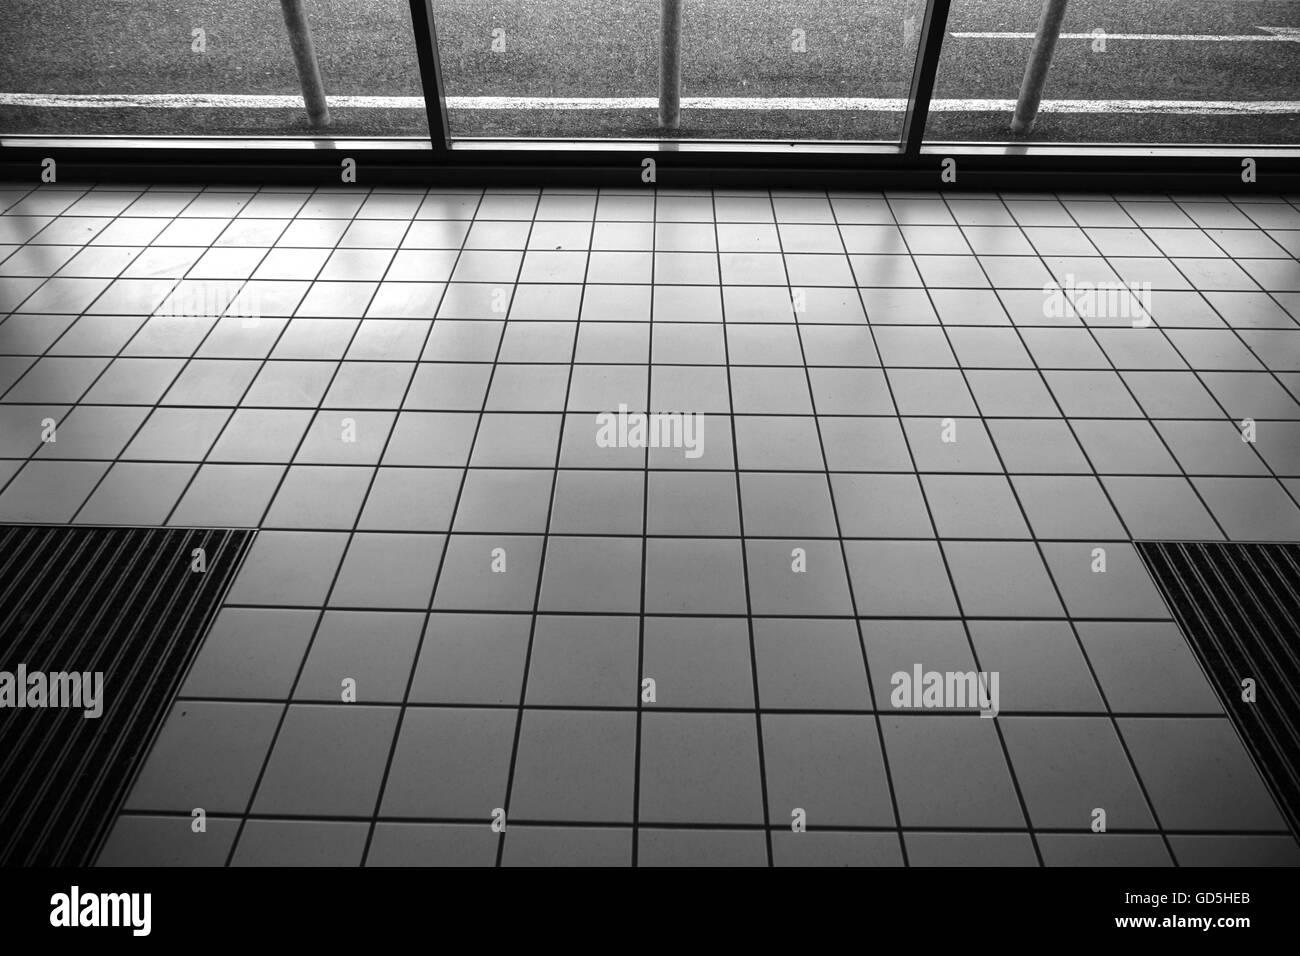 nursery foam mats cut squares play ideas in blogs white die and using purple black best tiles softtiles floor interlocking kids floors